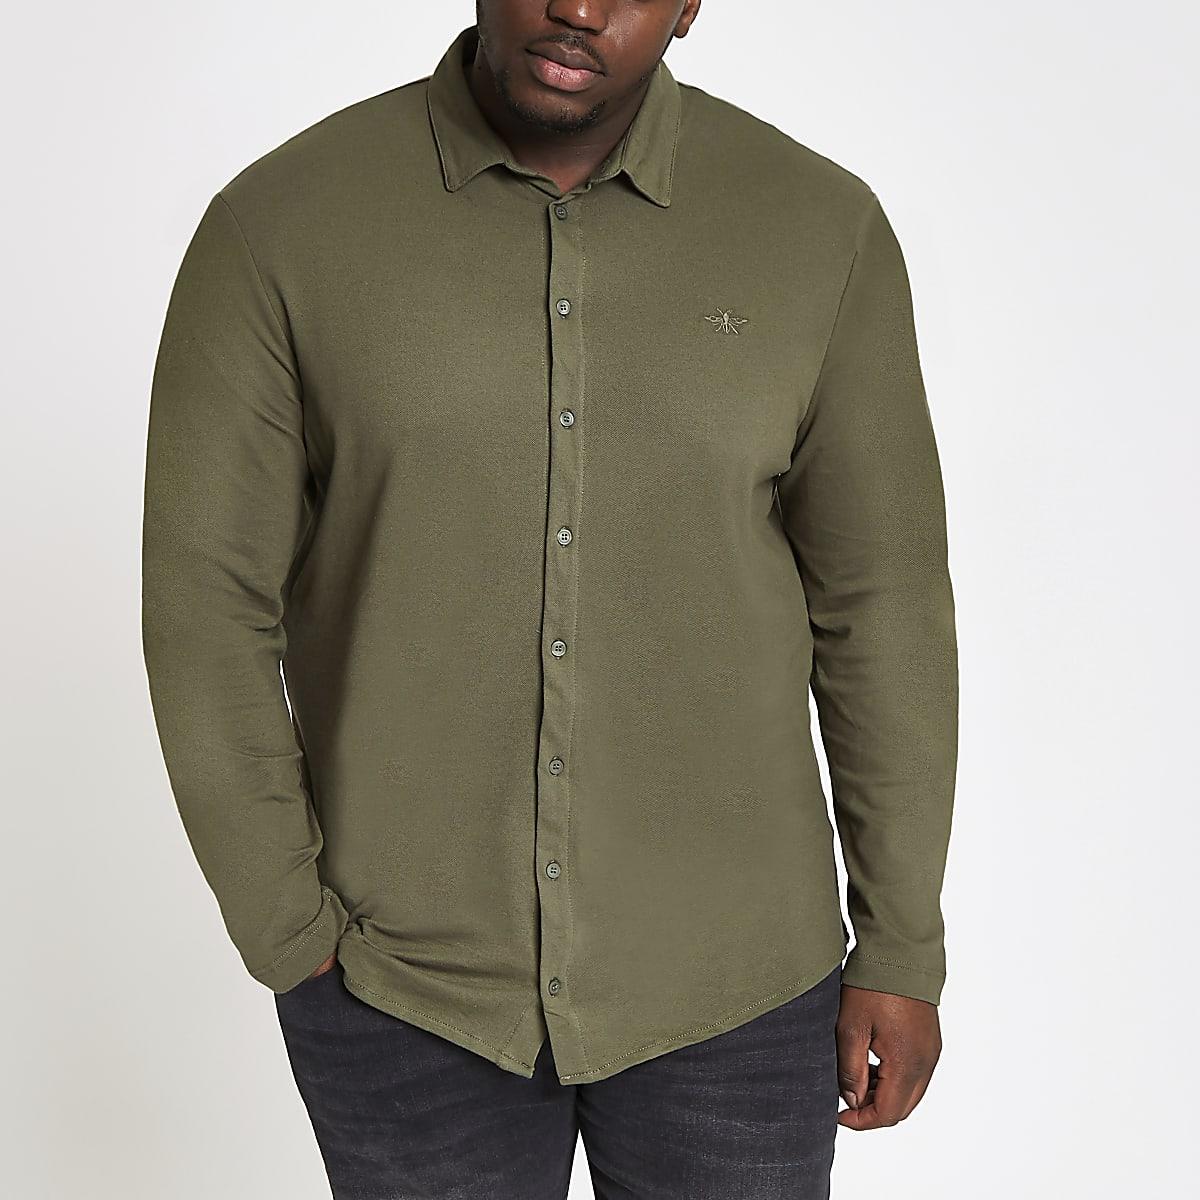 Donkergroen Overhemd.Big And Tall Donkergroen Overhemd Met Knoopsluiting Poloshirts